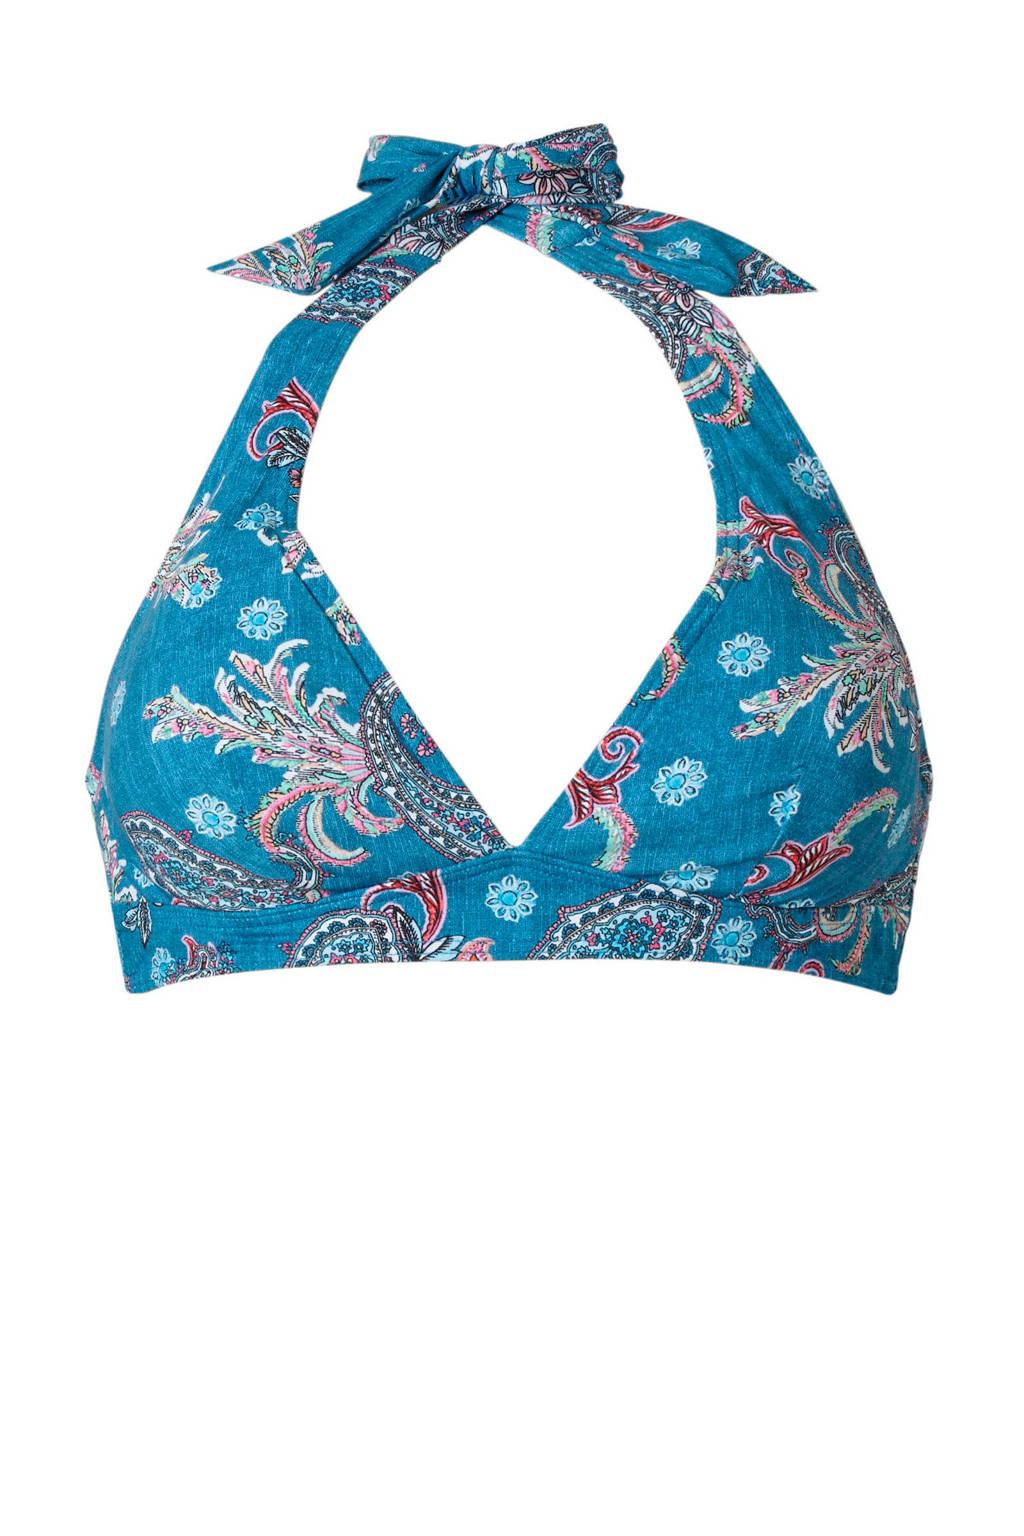 ESPRIT Women Beach halterbikinitop met all over print blauw, Blauw/wit/roze